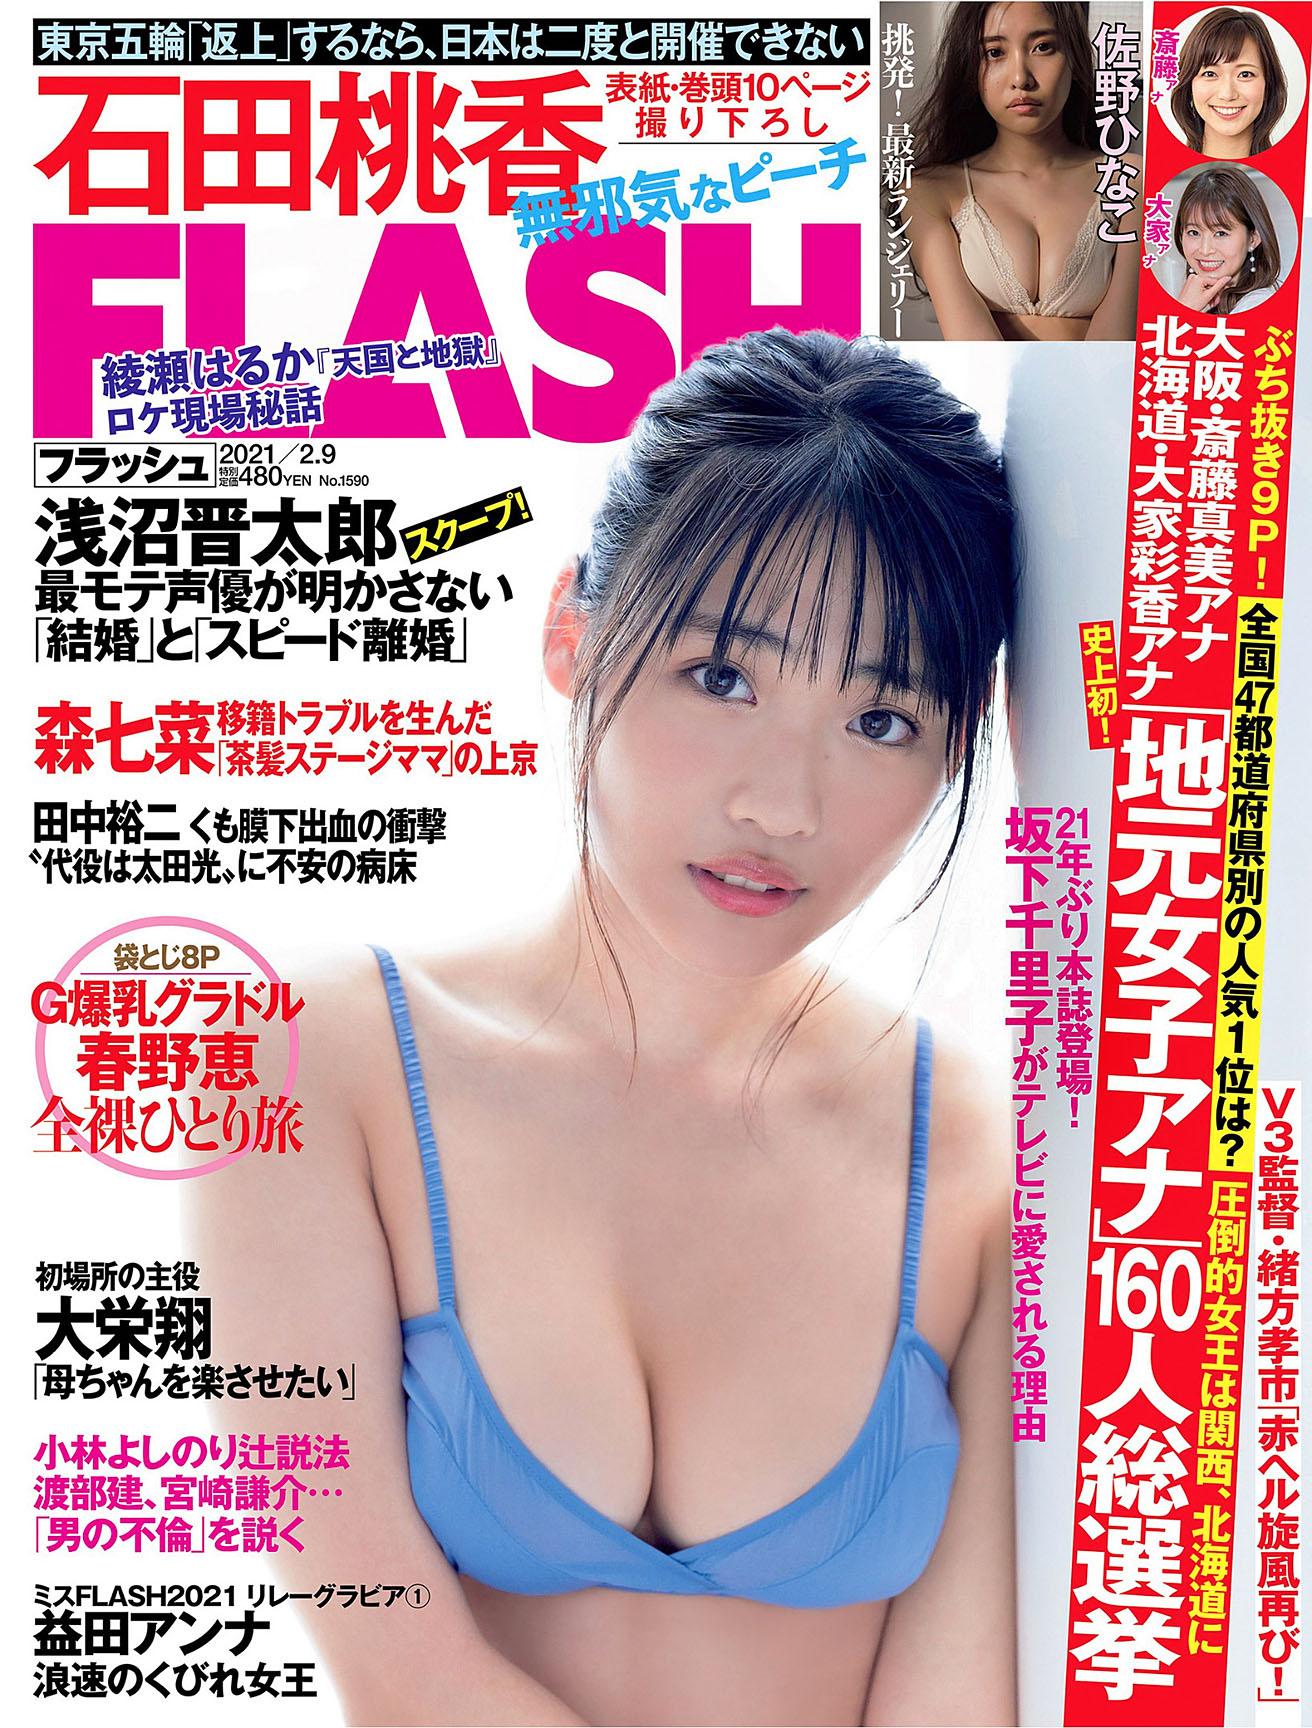 Momoka Ishida Flash 210209 01.jpg